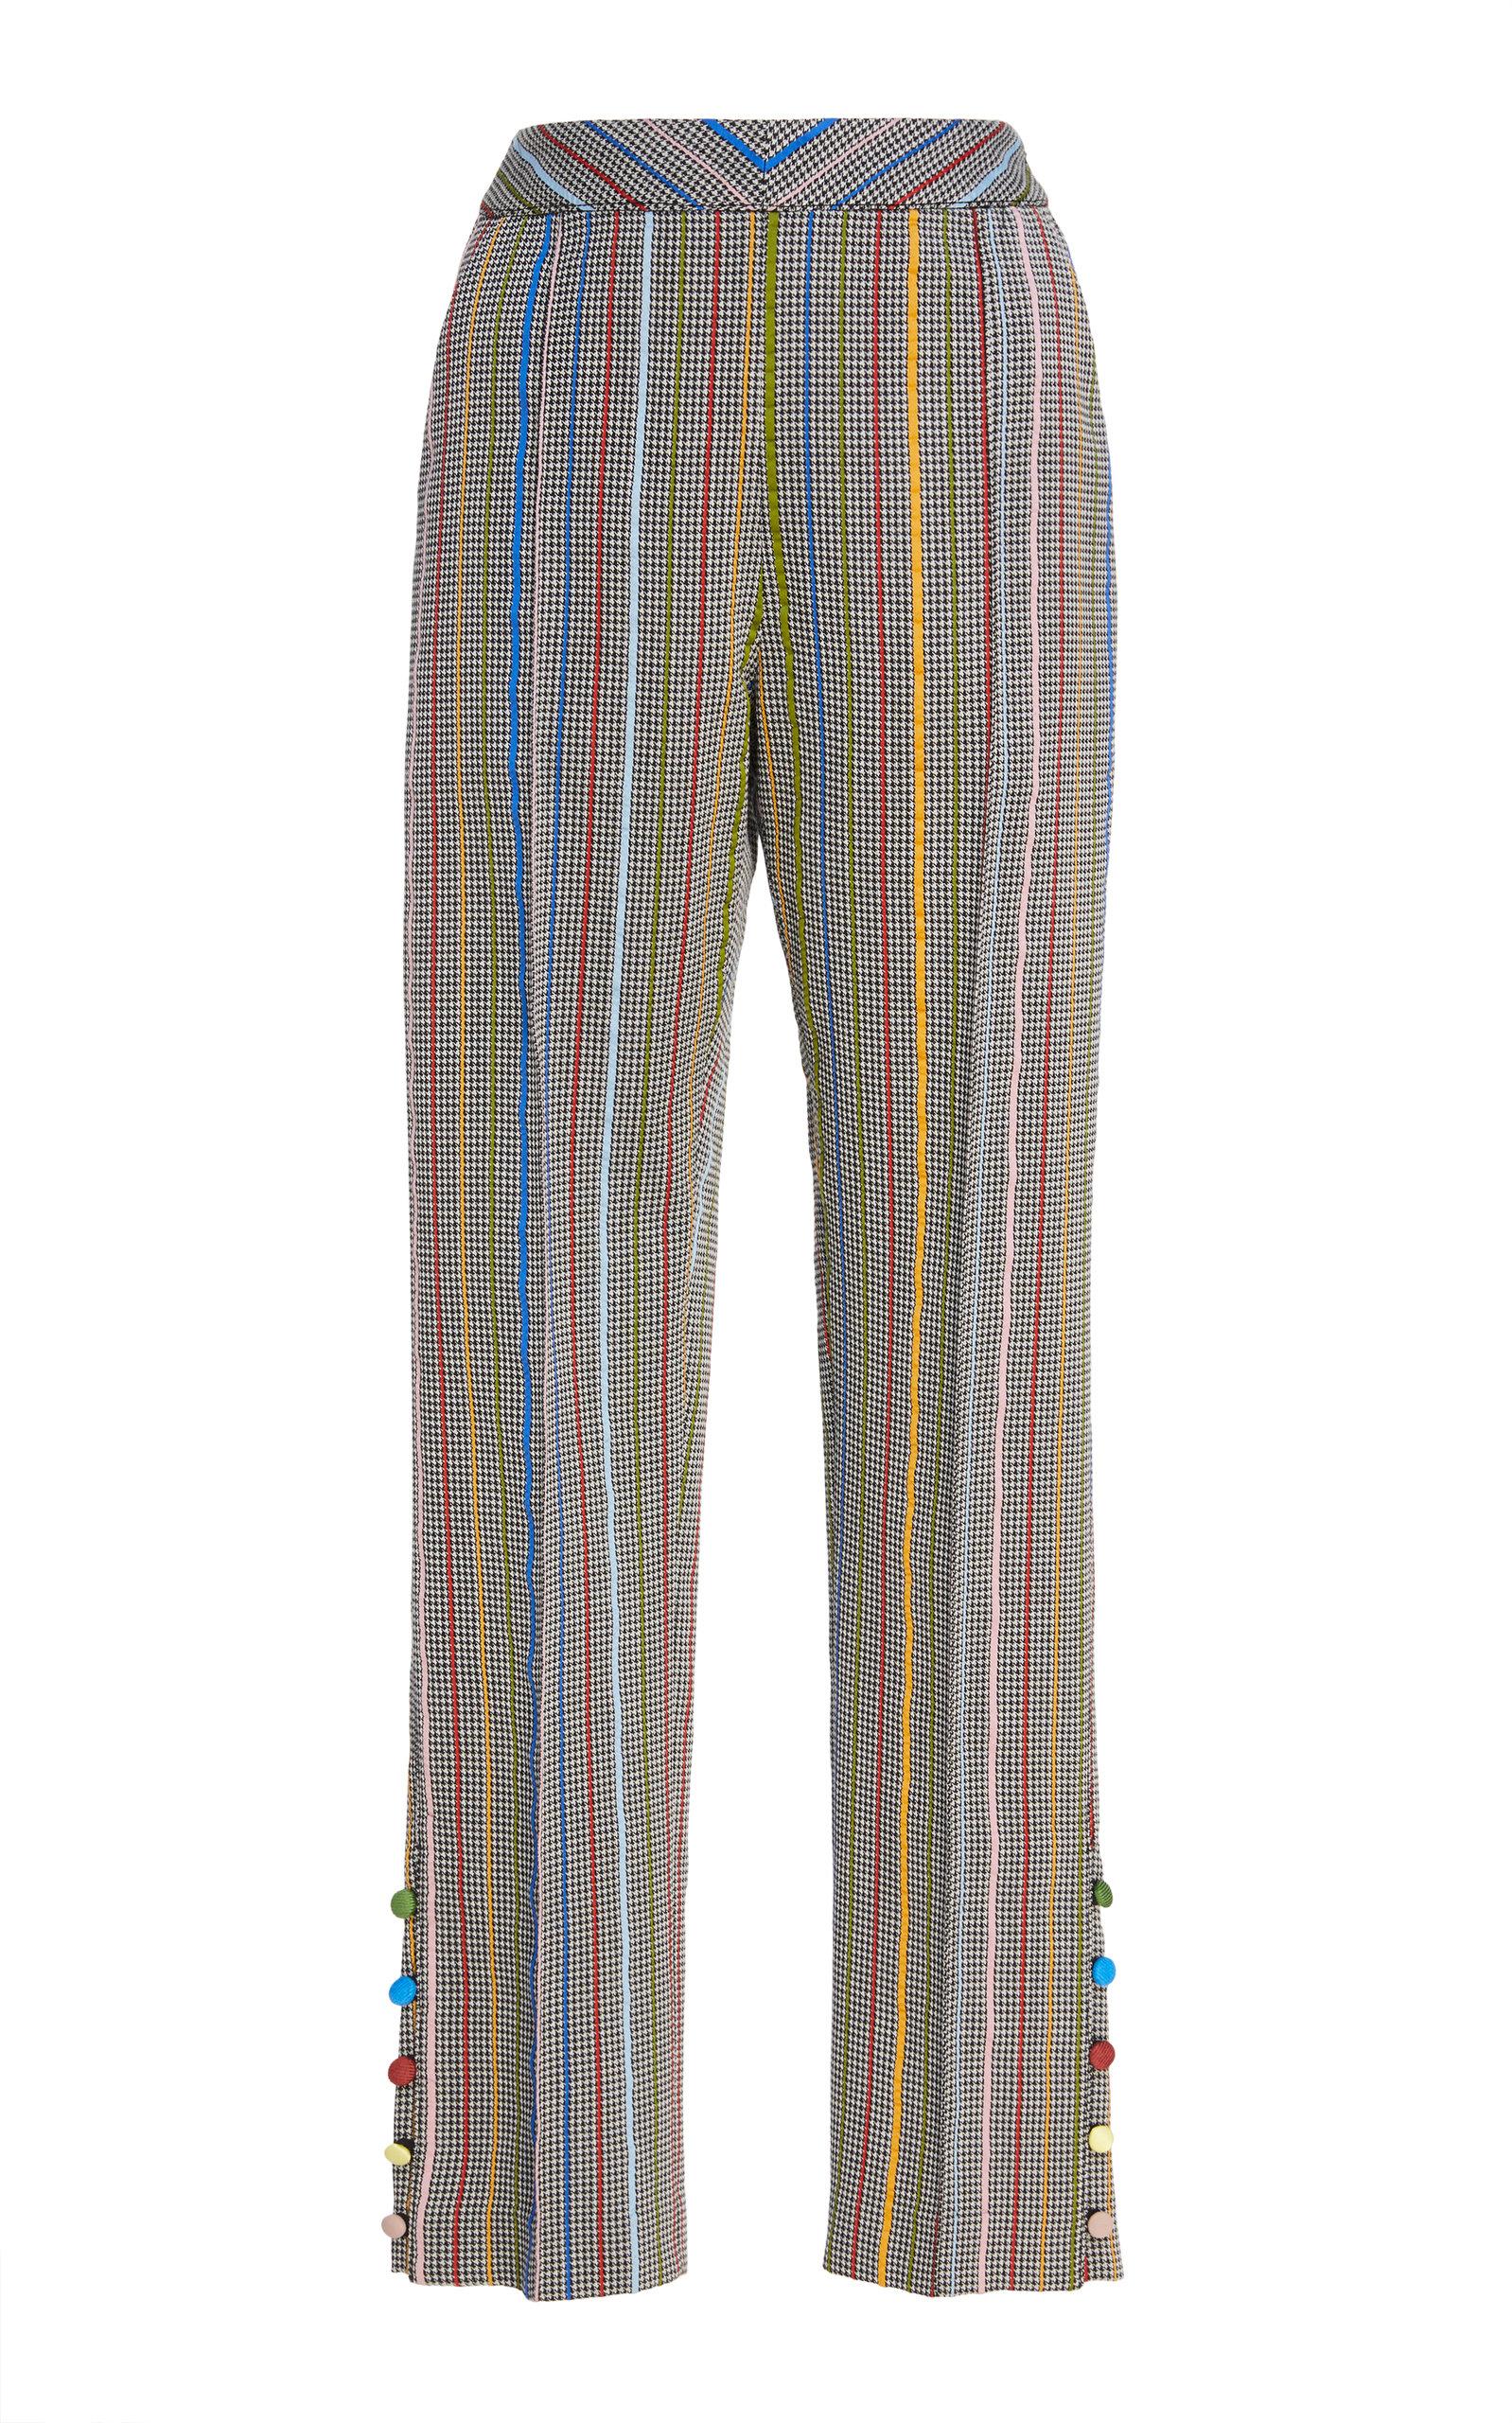 Oboe Wool And Silk-Blend Jacquard Slim-Leg Pants in Gray